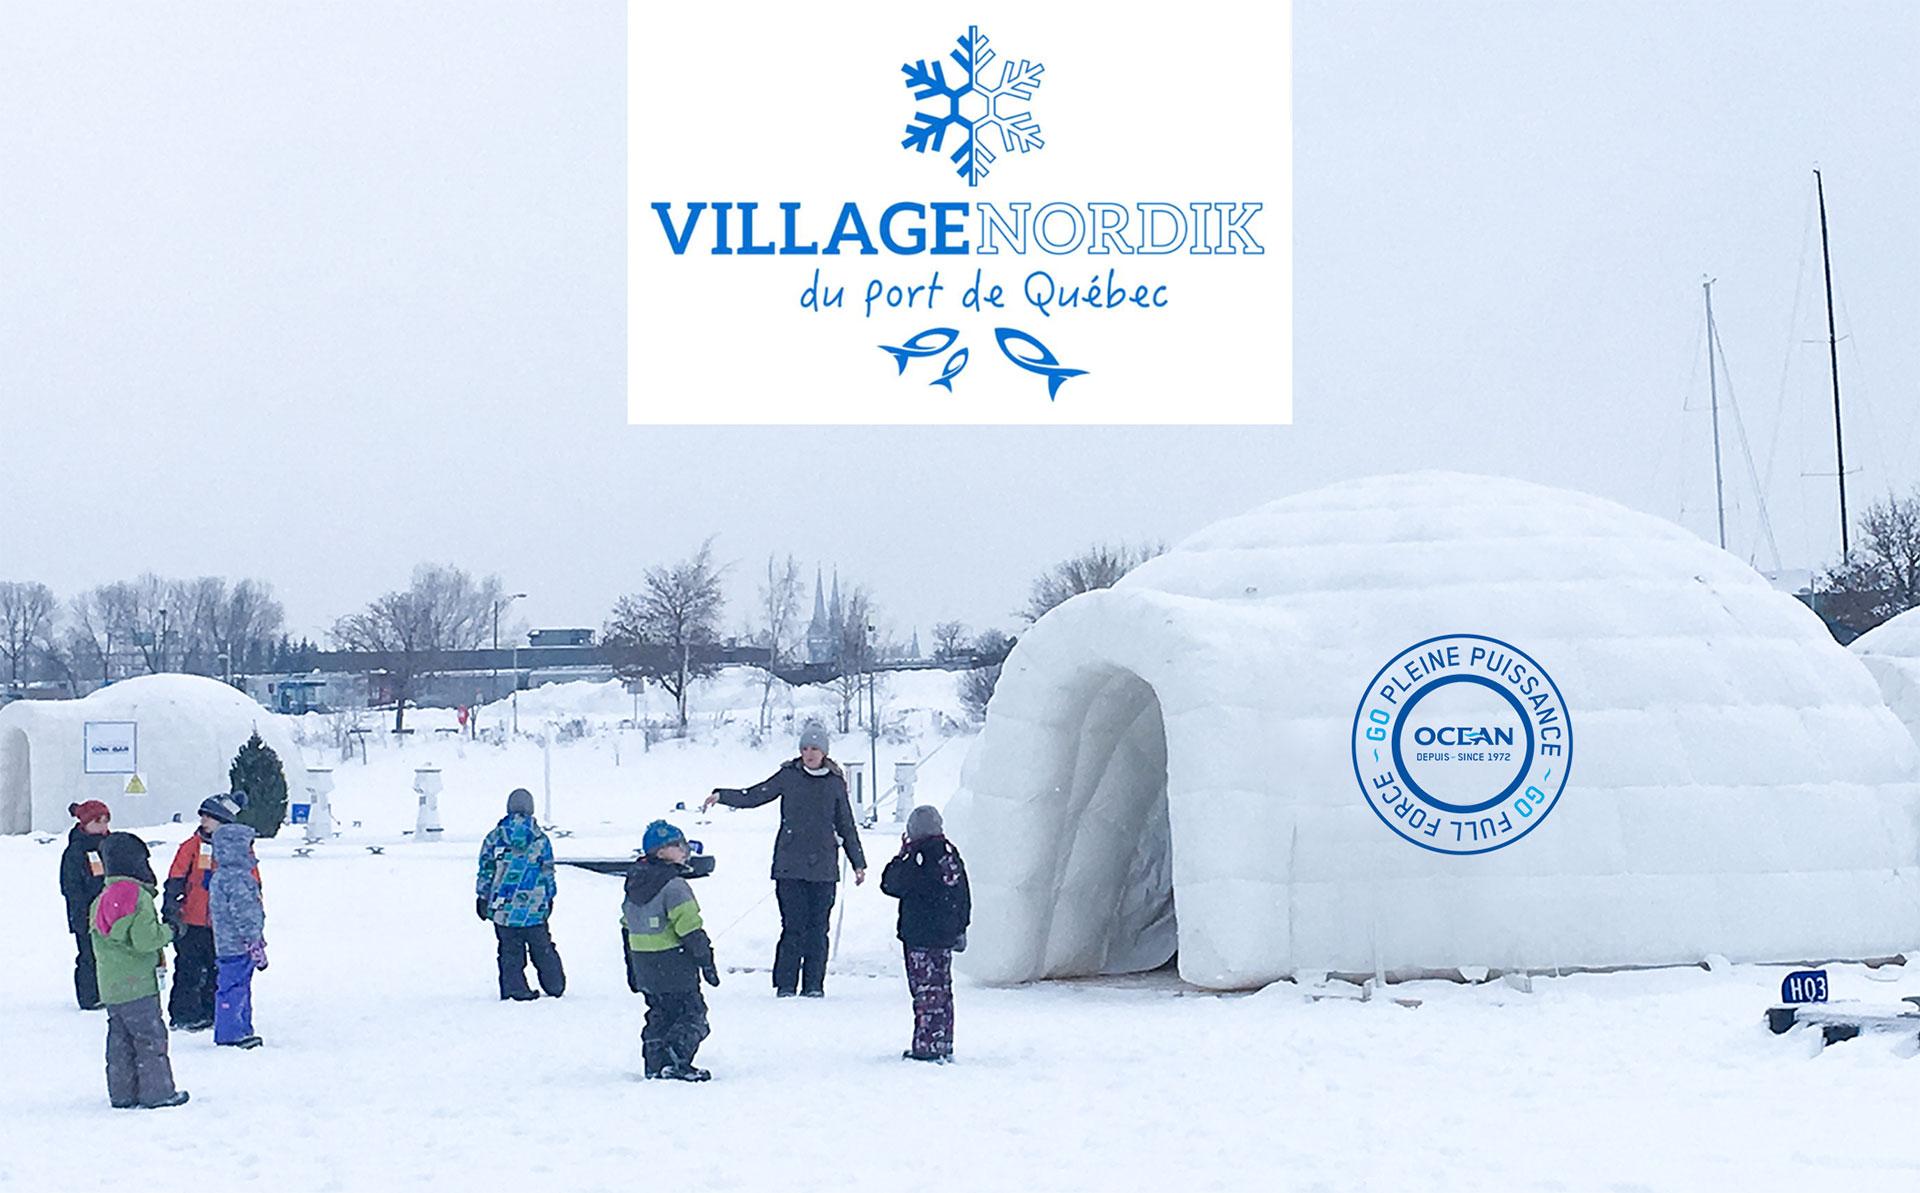 Ocean is a sponsor of the Village Nordik du Port de Québec